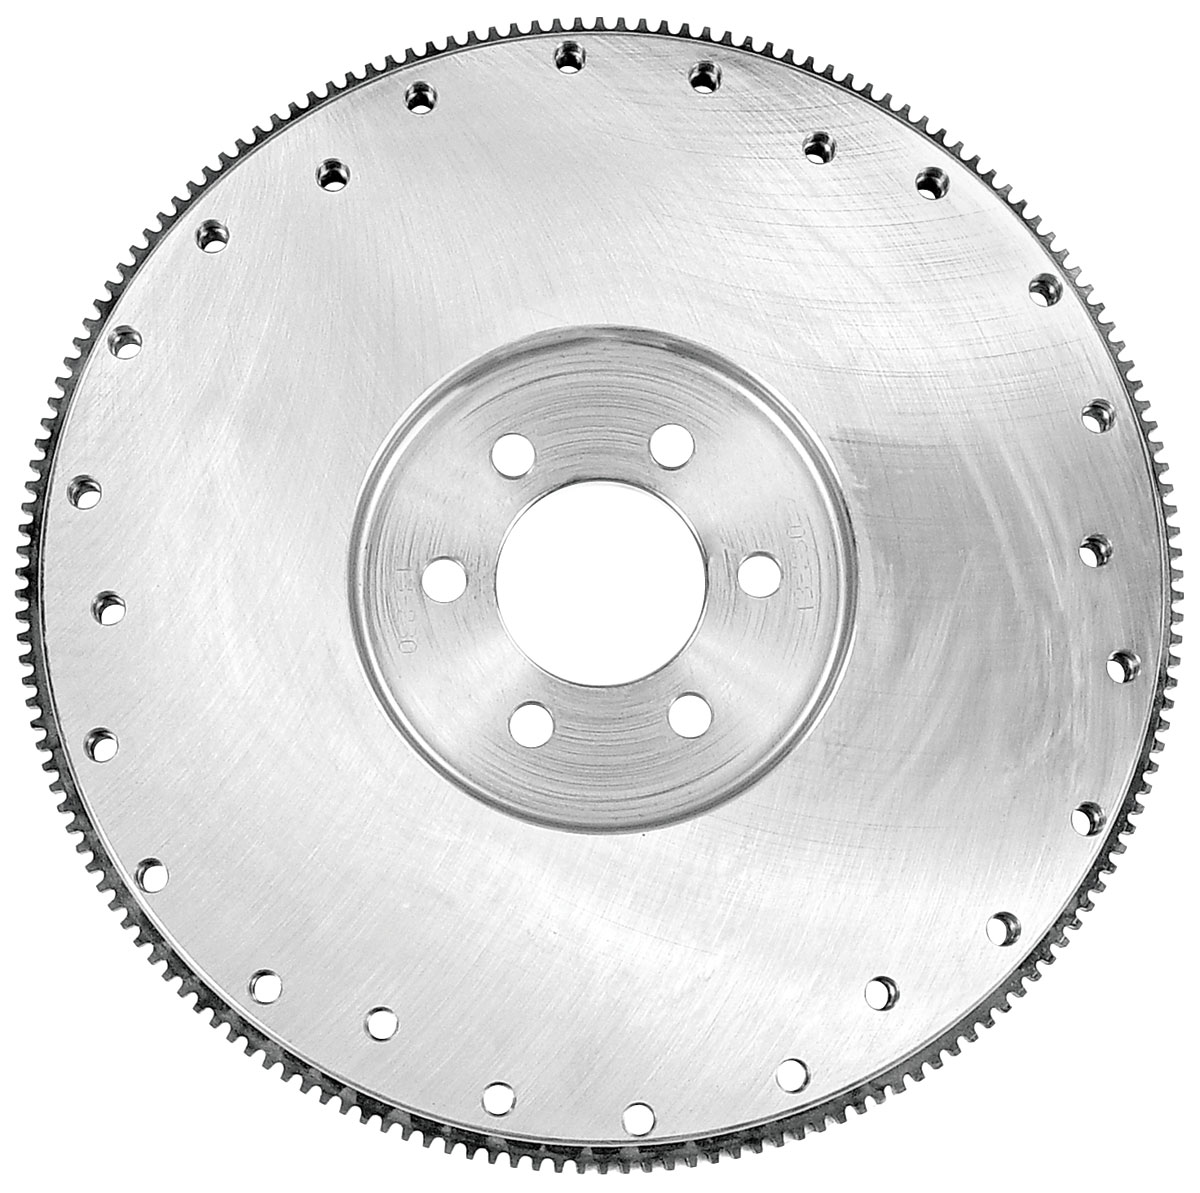 Photo of Catalina/Full Size Flywheel, Billet Steel externally balanced